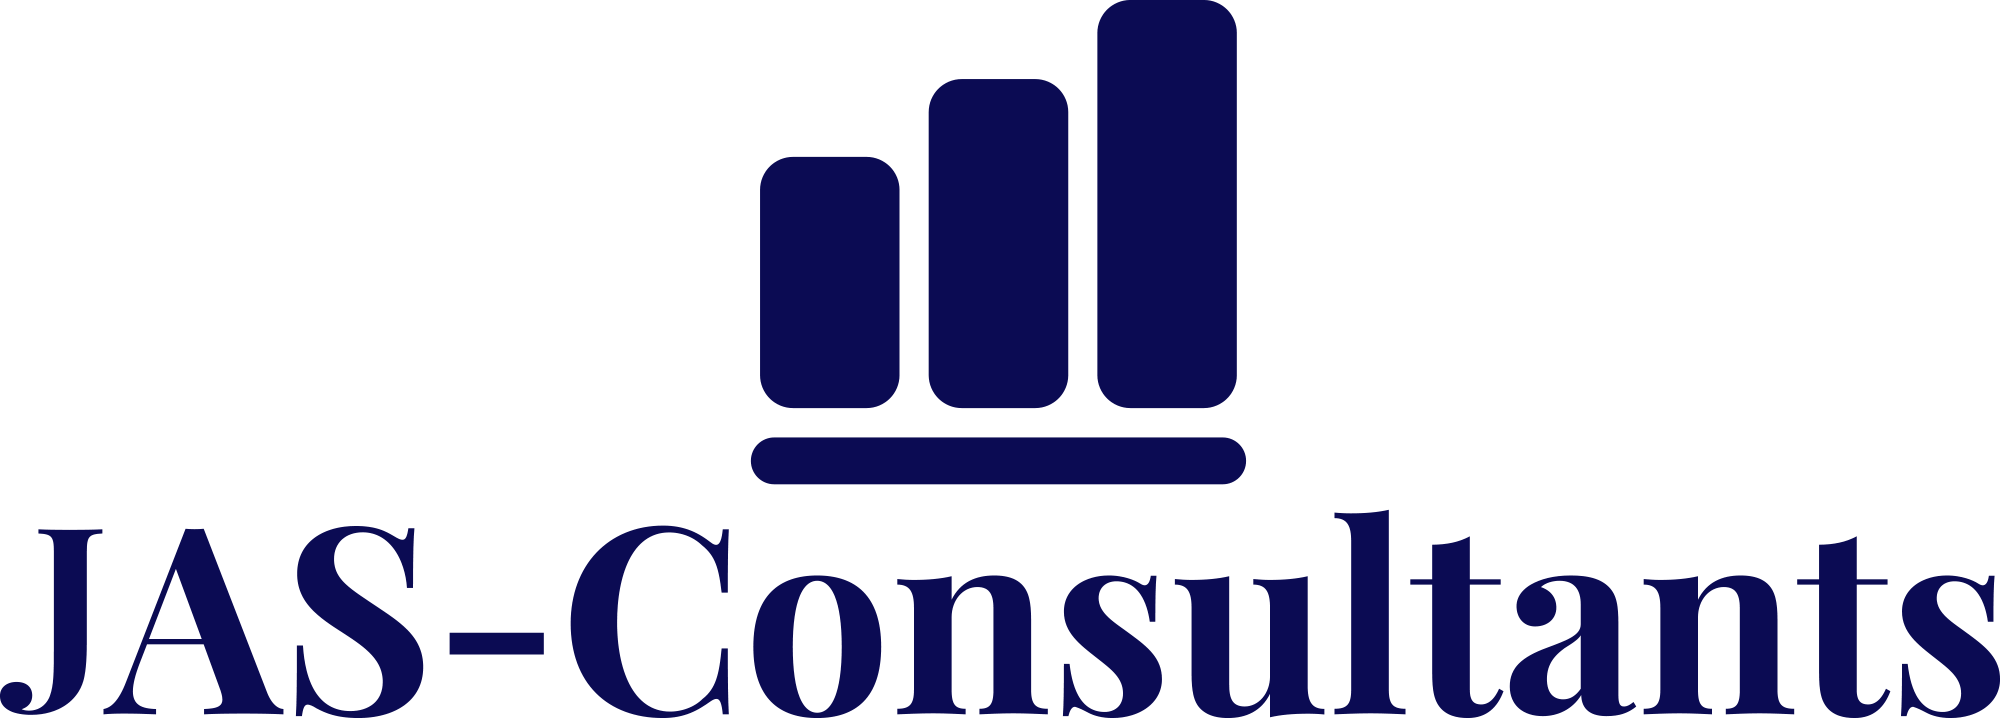 JAS-Consultants  Logo